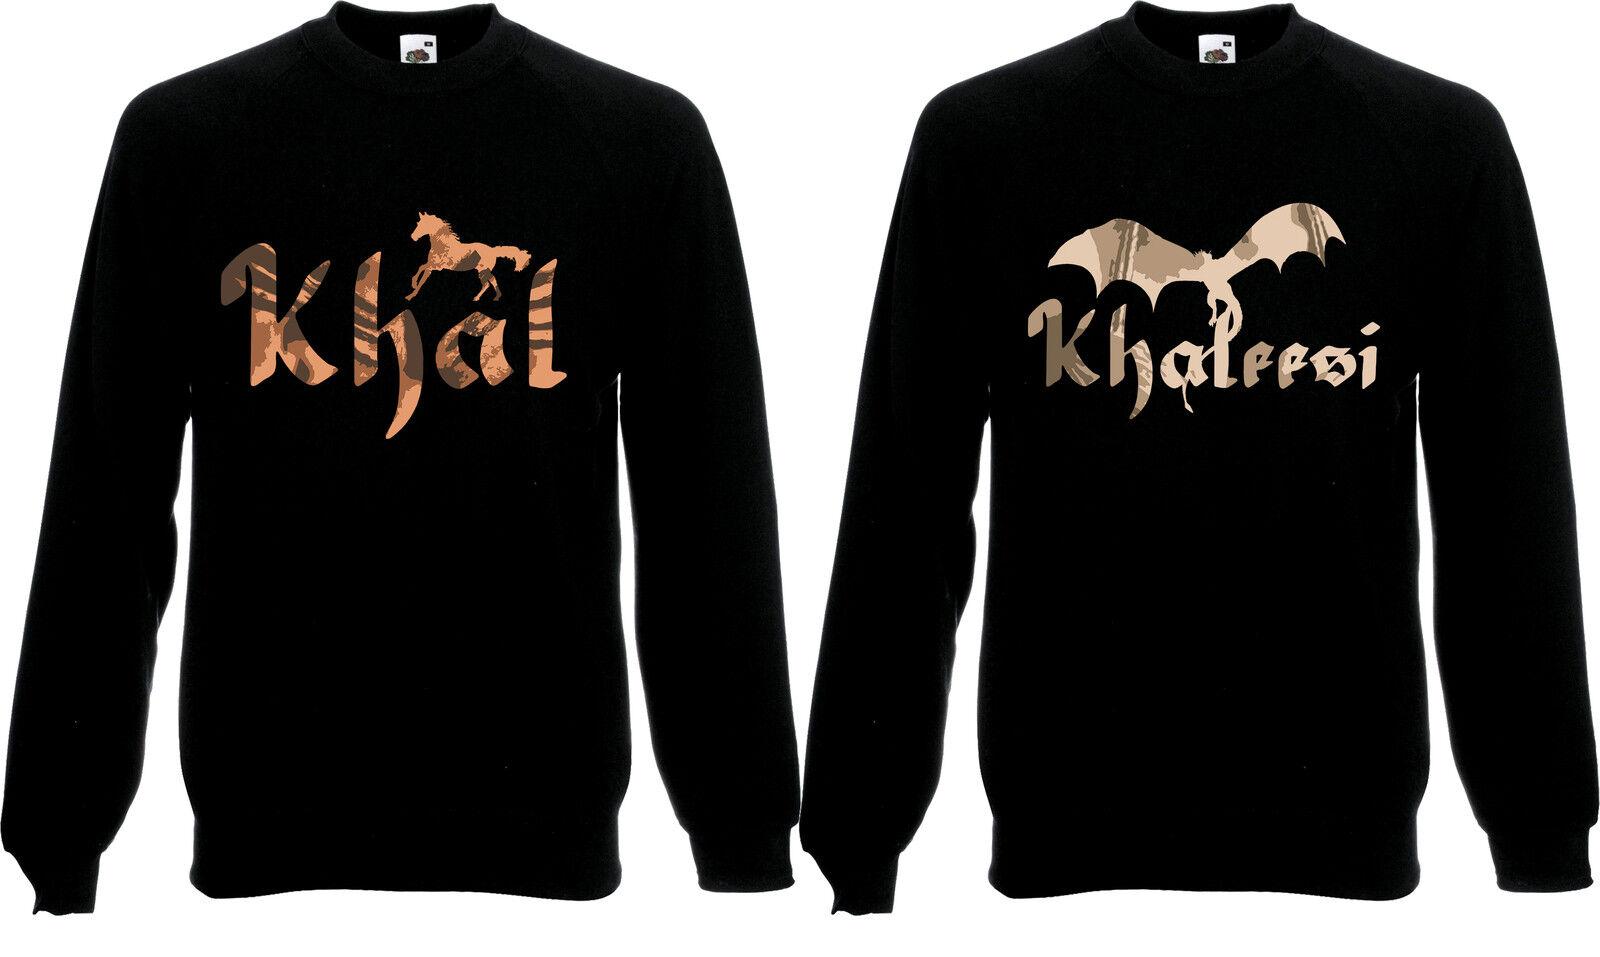 Khal & Khaleesi Valentine Fantasy Couples HorseJumper Sweatshirt Sweat Top AF11